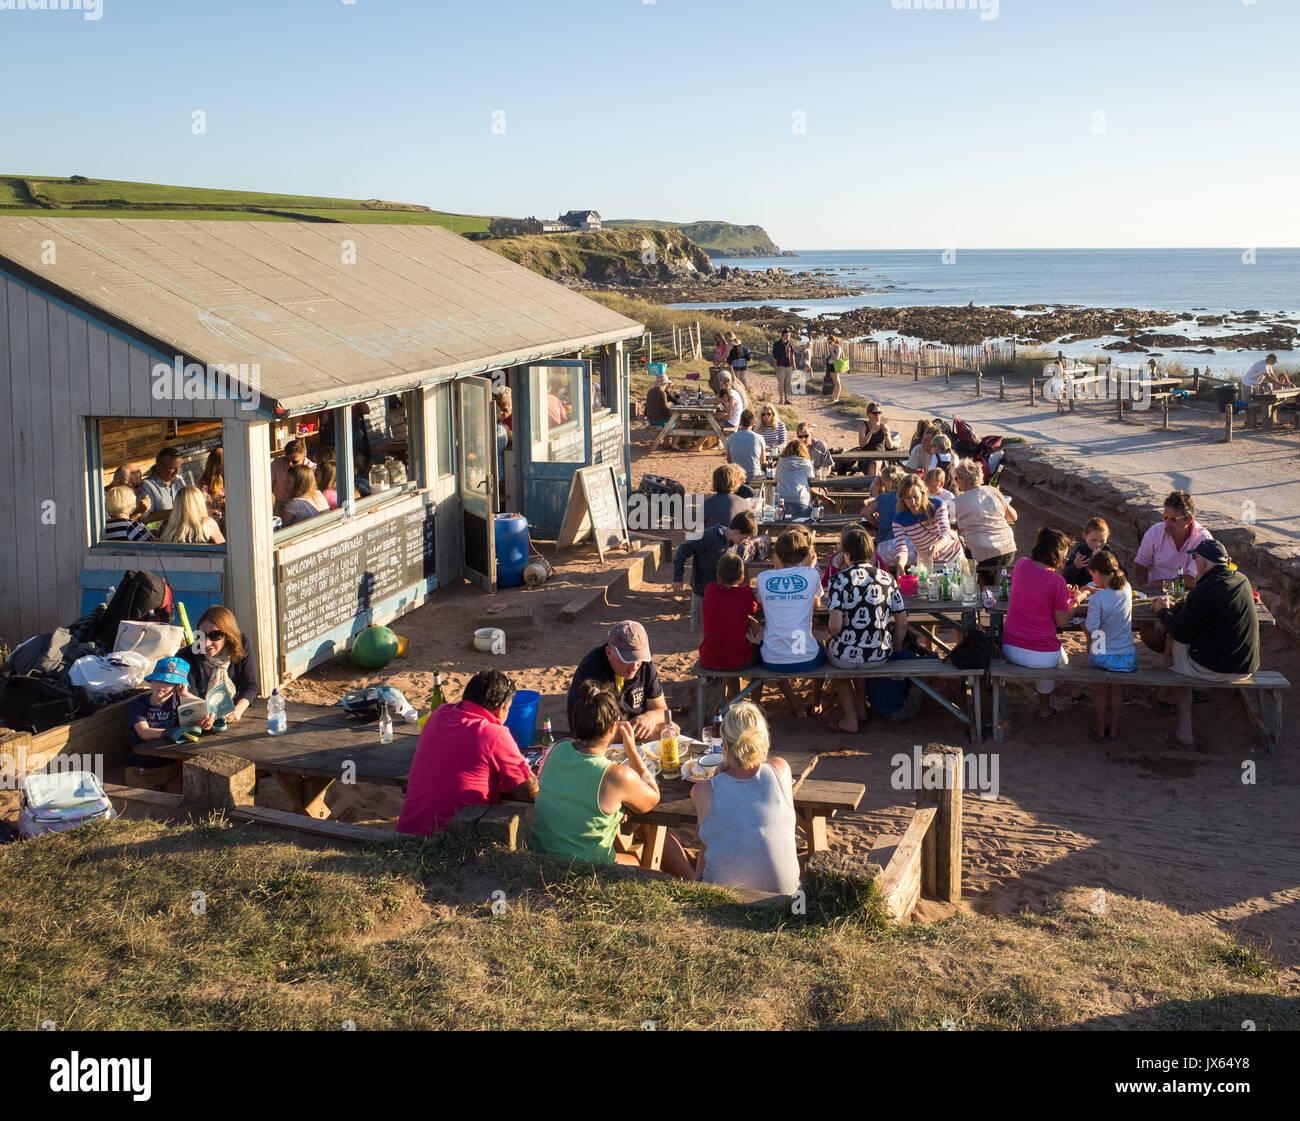 The Beach House beach cafe at South Milton Sands near Thurlestone in the South Hams in Devon Stock Photo